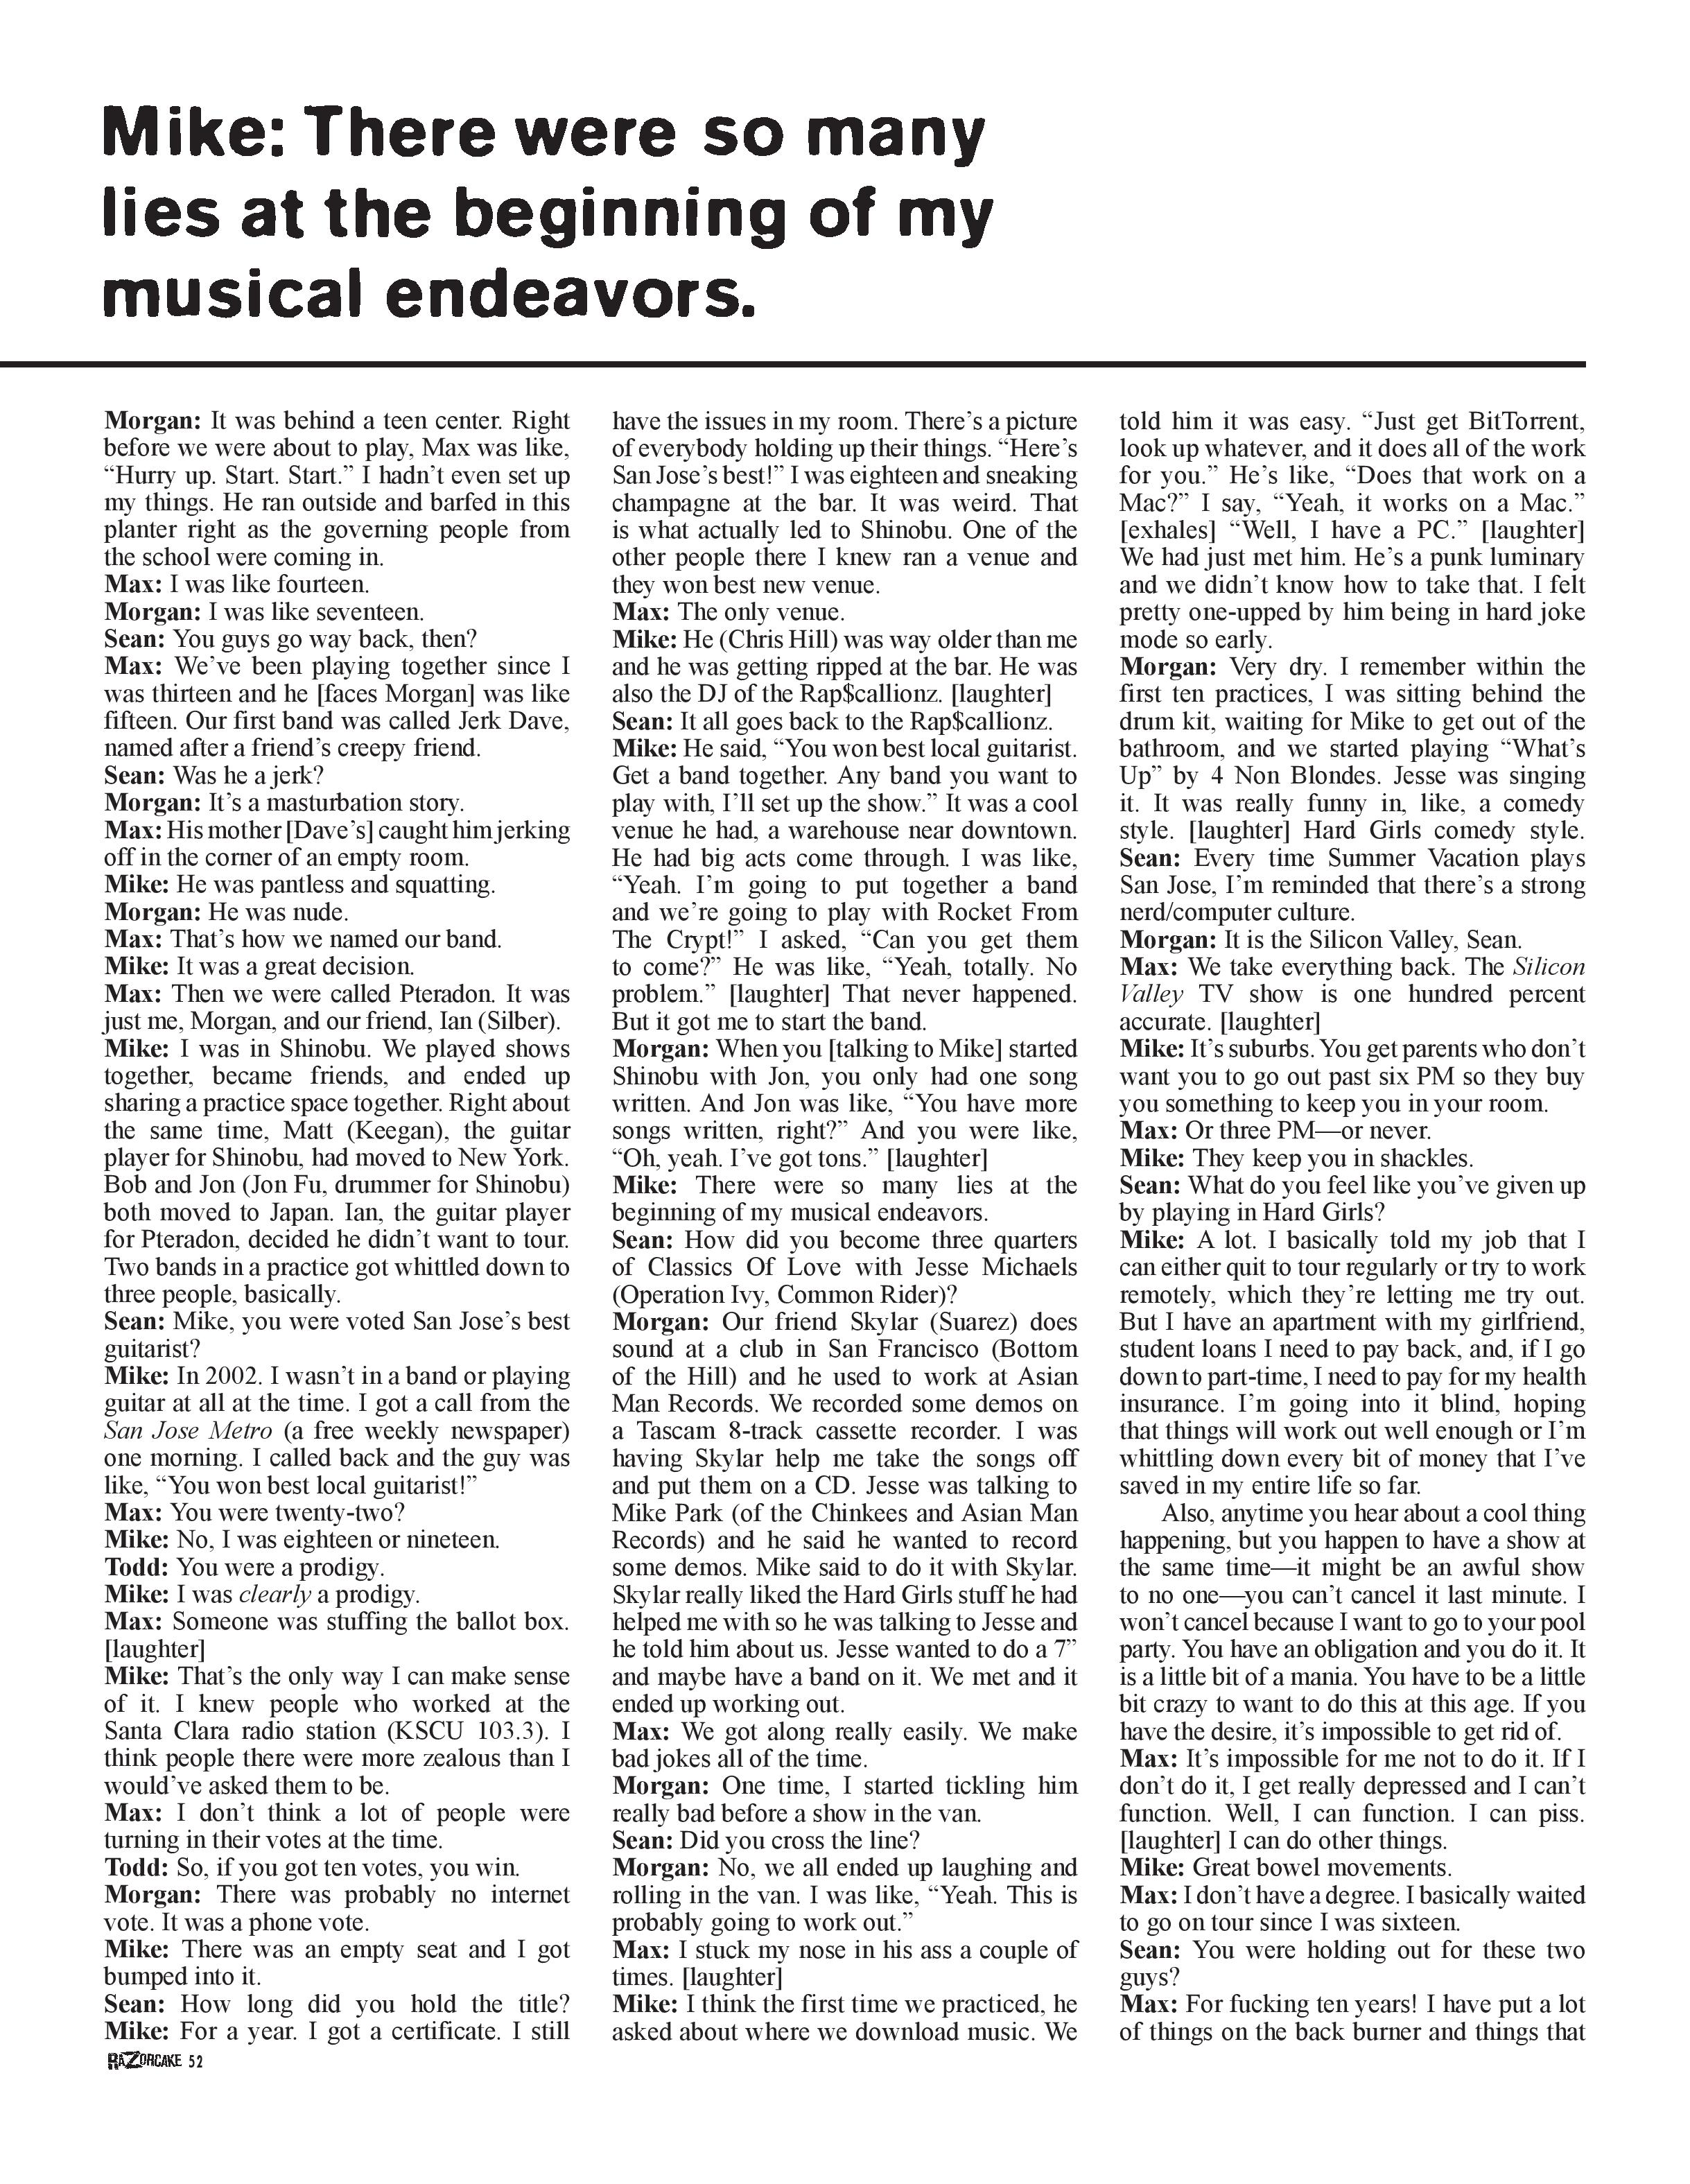 hard_girls_interview-page-005.jpg